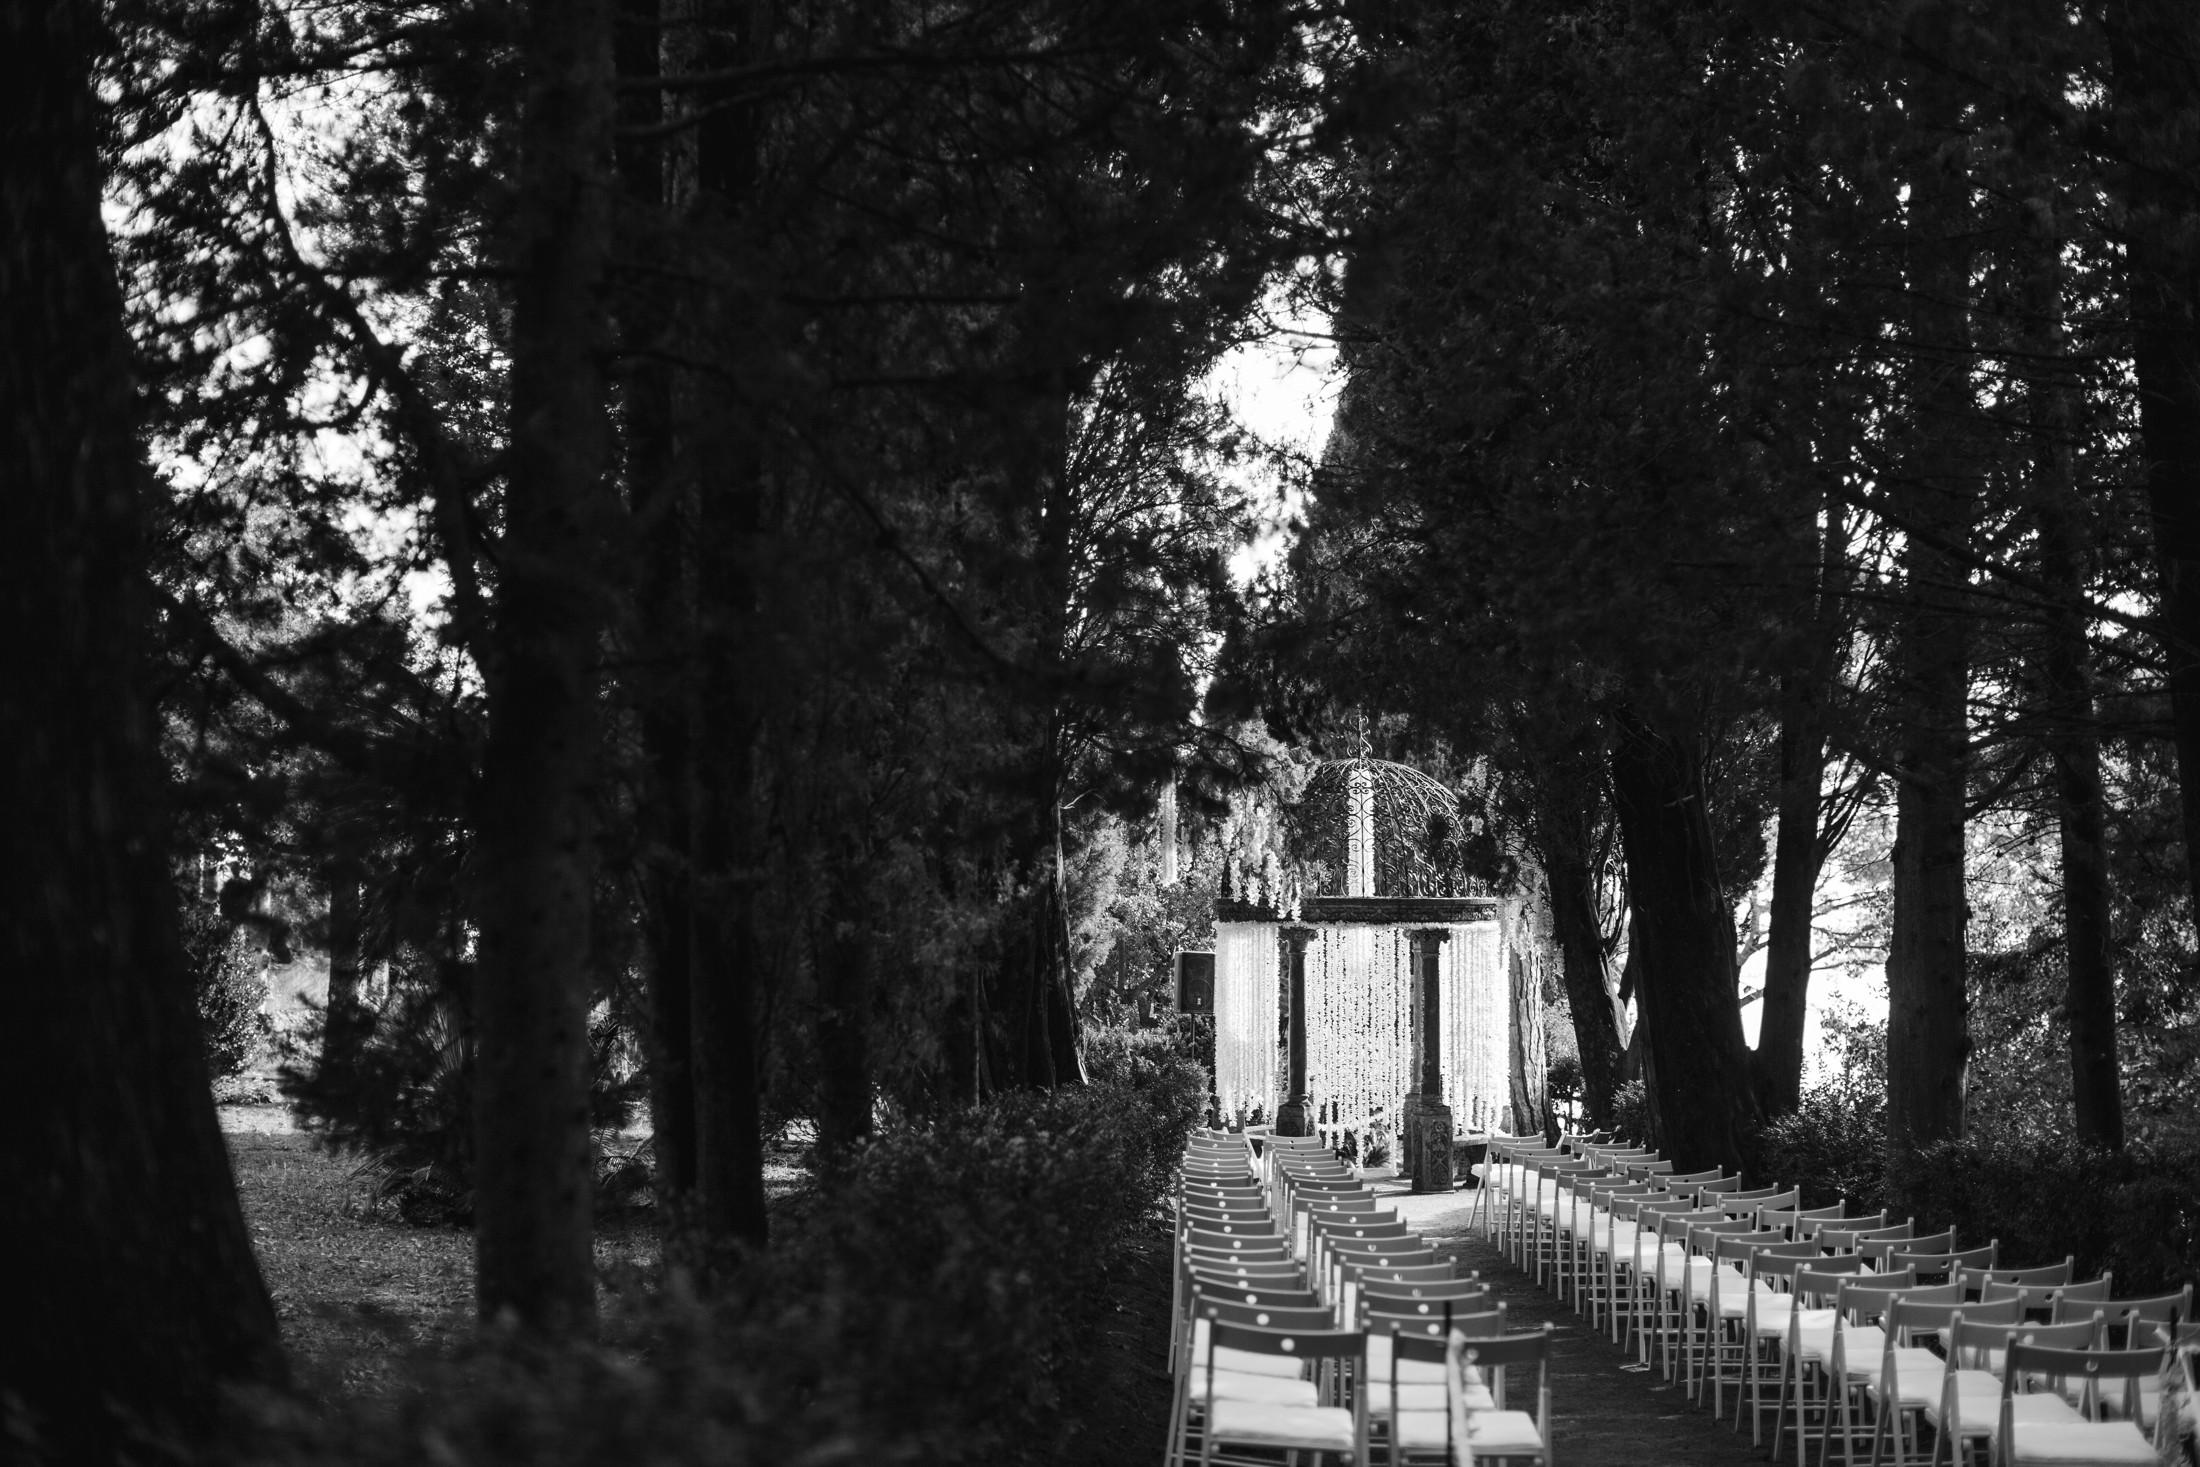 luxury wedding wedding ceremony setting at villa cimbrone in black and white